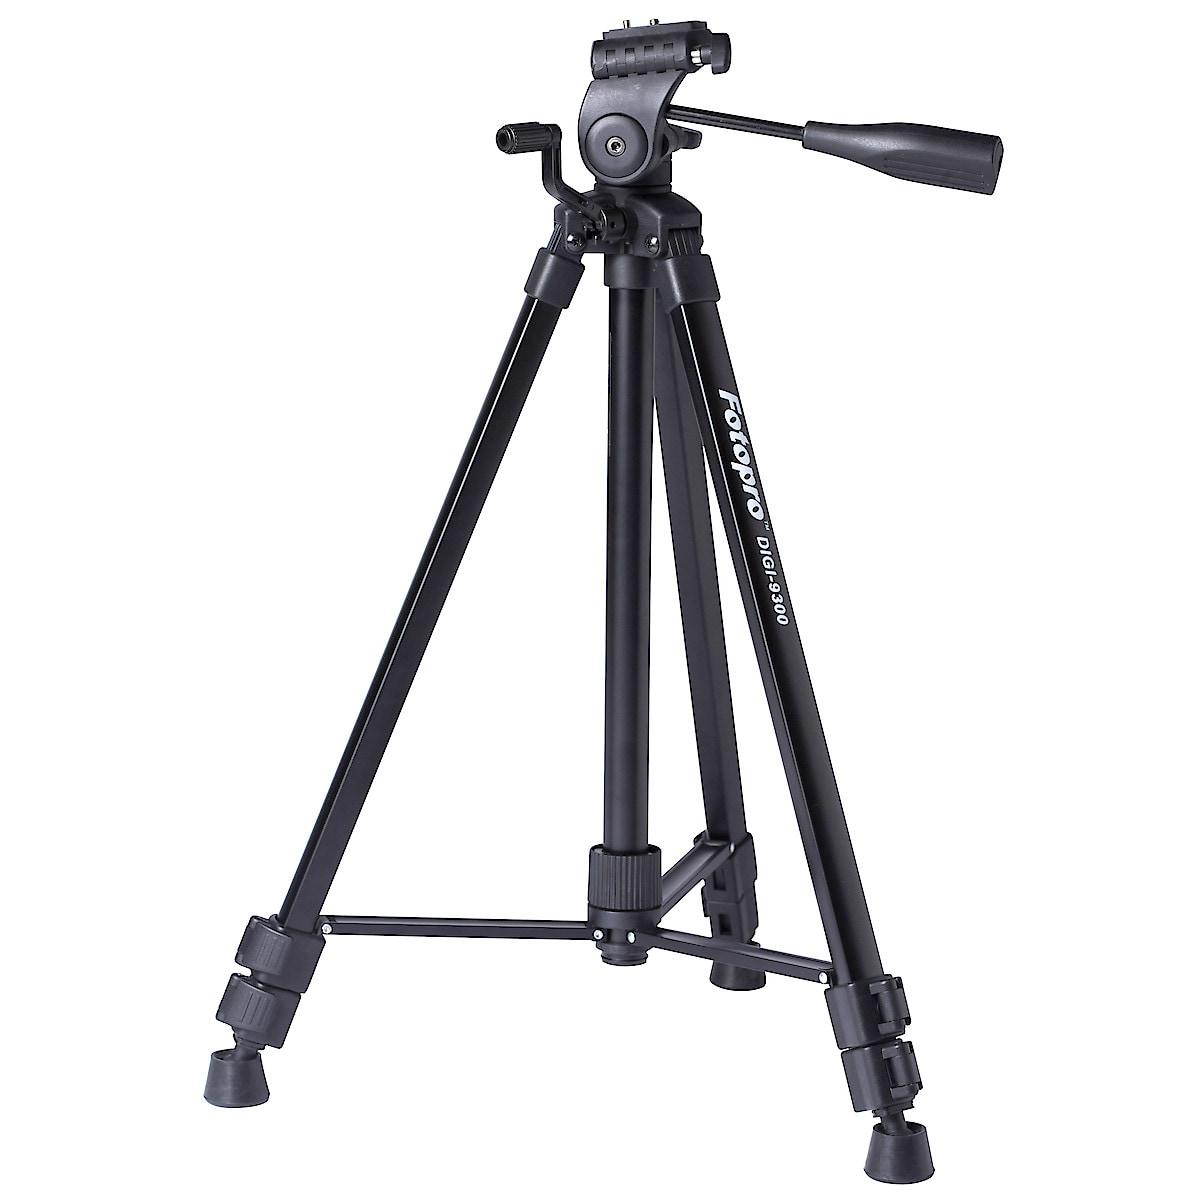 Kamerajalusta Rollei Compact Traveler Star S2